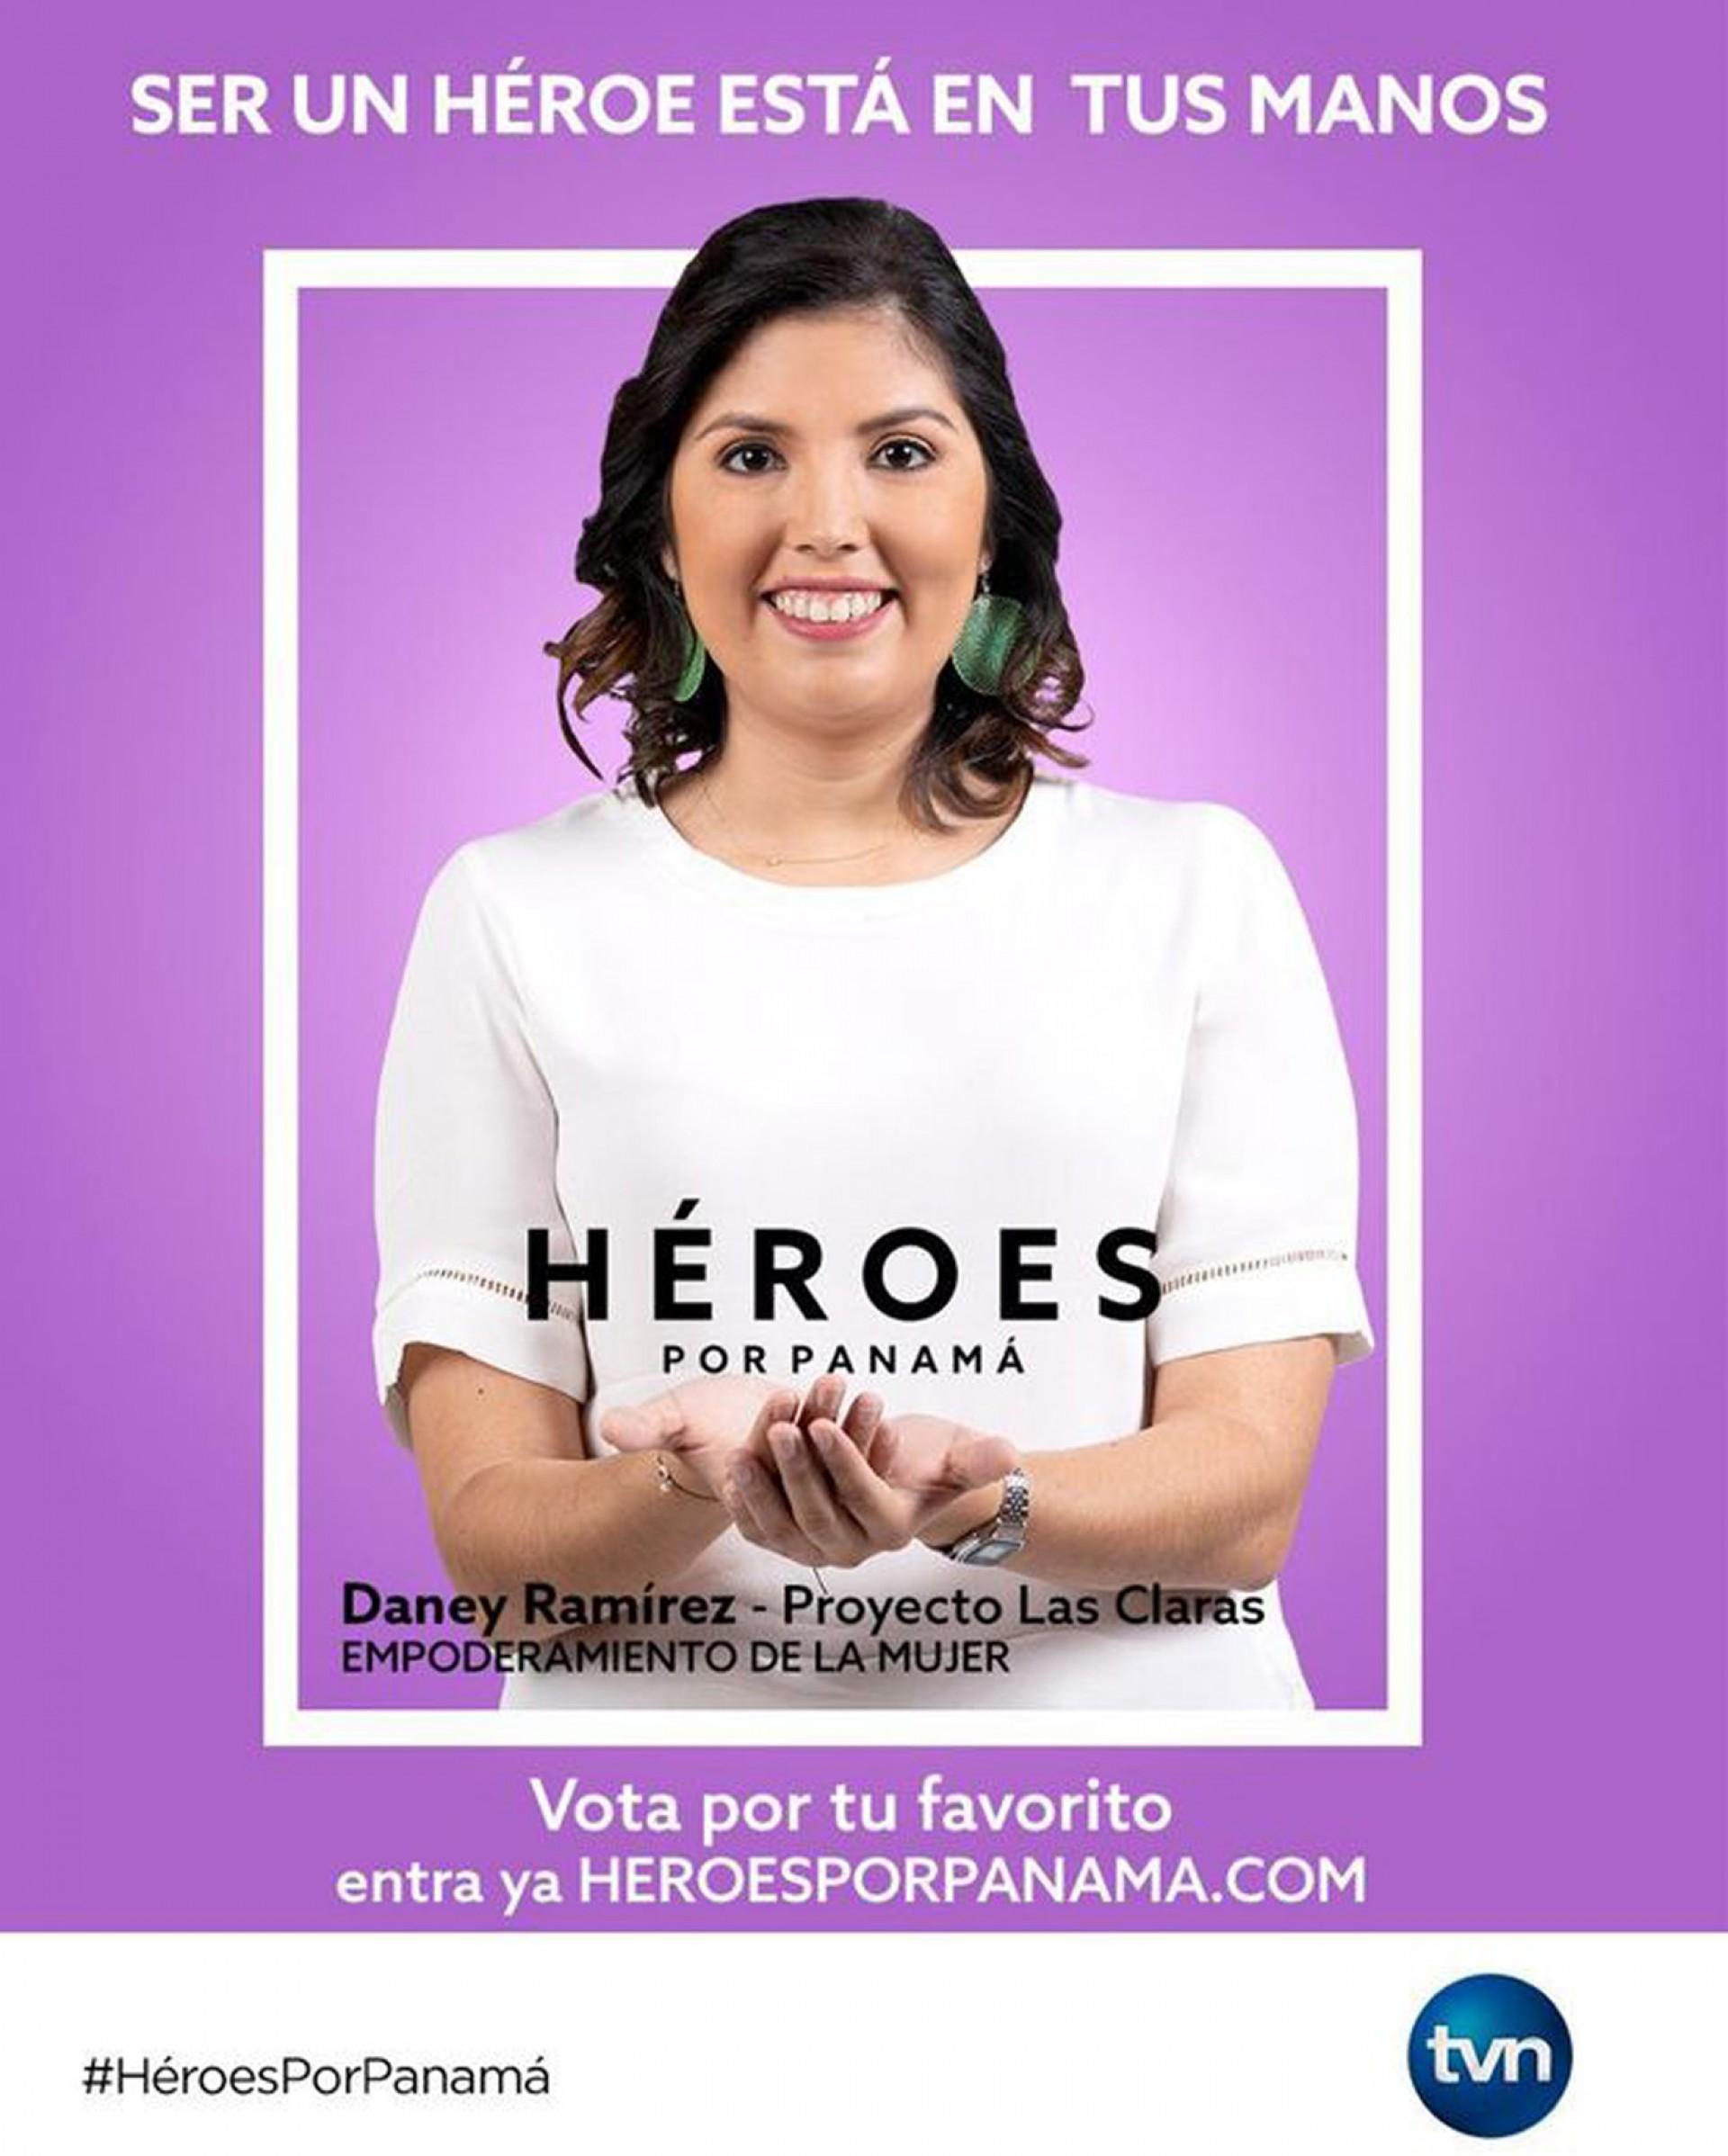 Congratulations Daney Ramirez! Panama Heroine